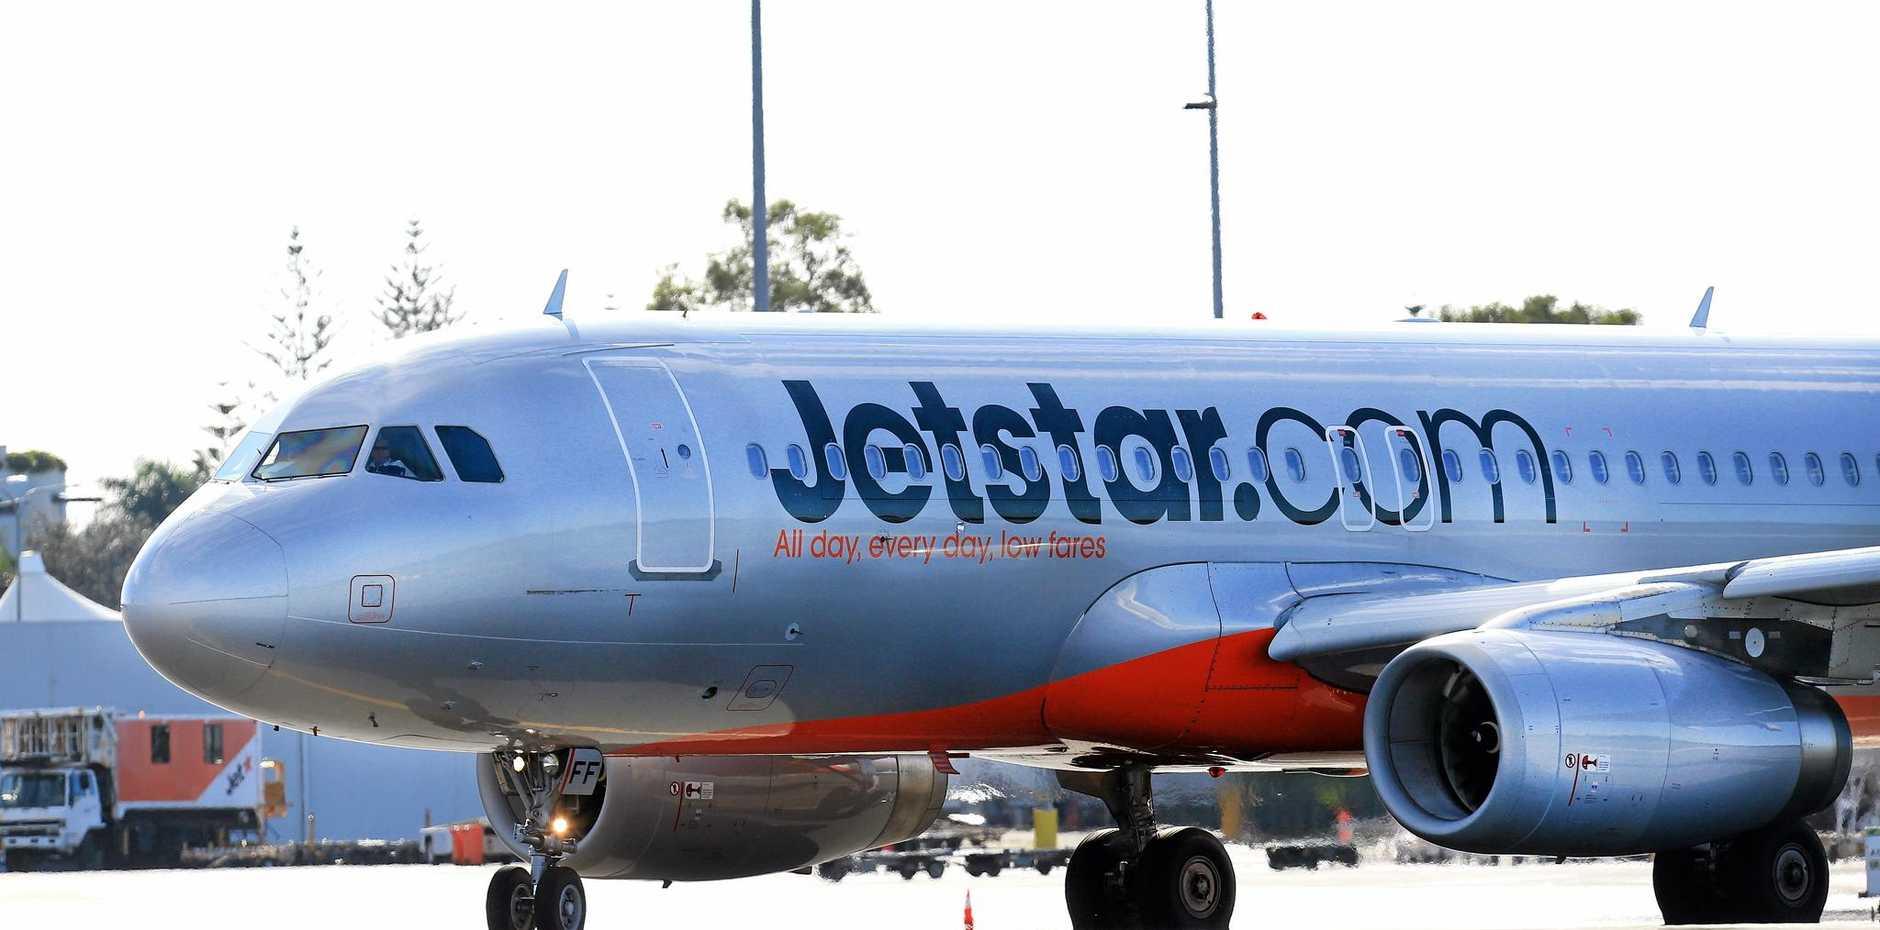 MALFUNCTION: Passengers wait three days for bags on Jetstar flight.